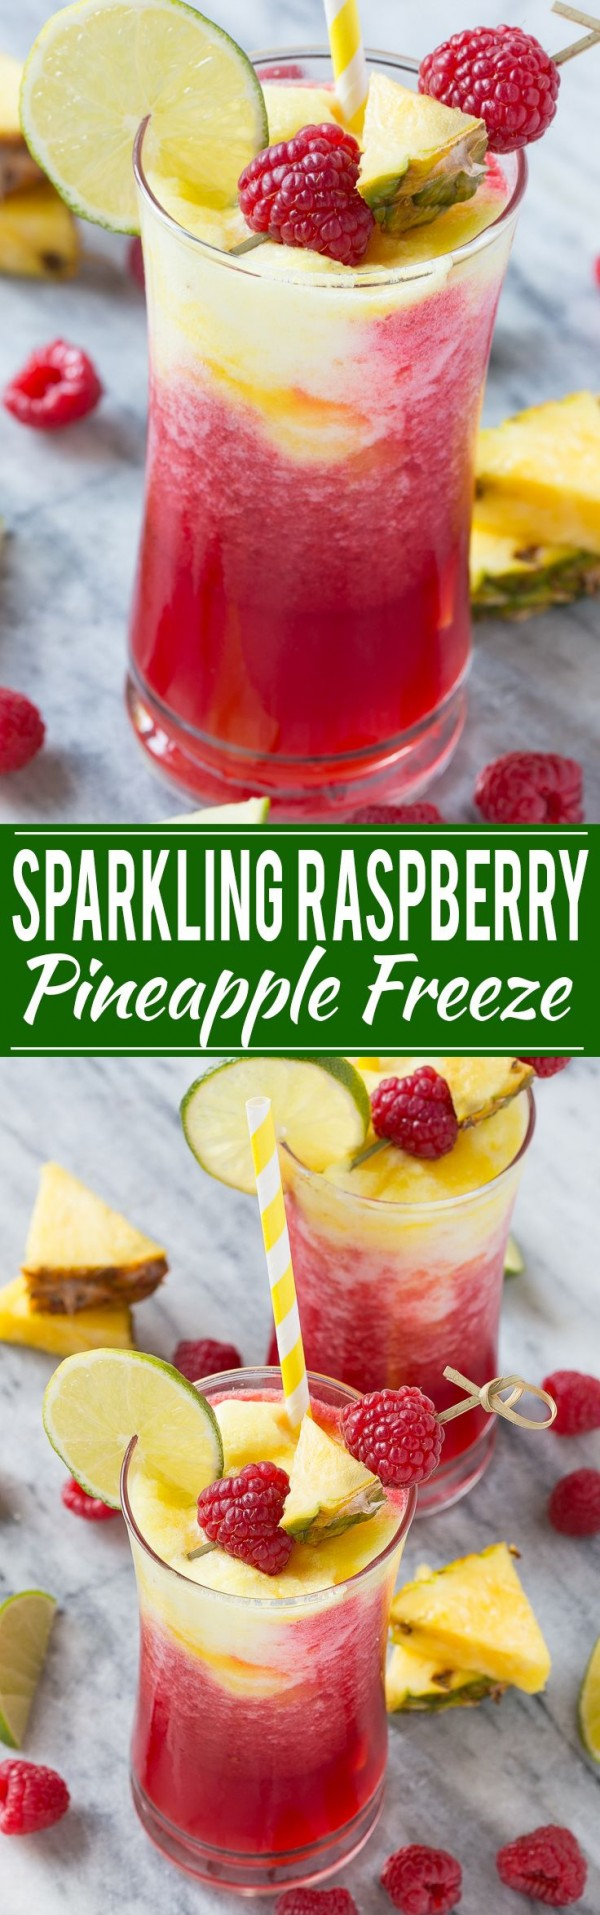 Get the recipe Sparkling Raspberry Pineapple Freeze @recipes_to_go